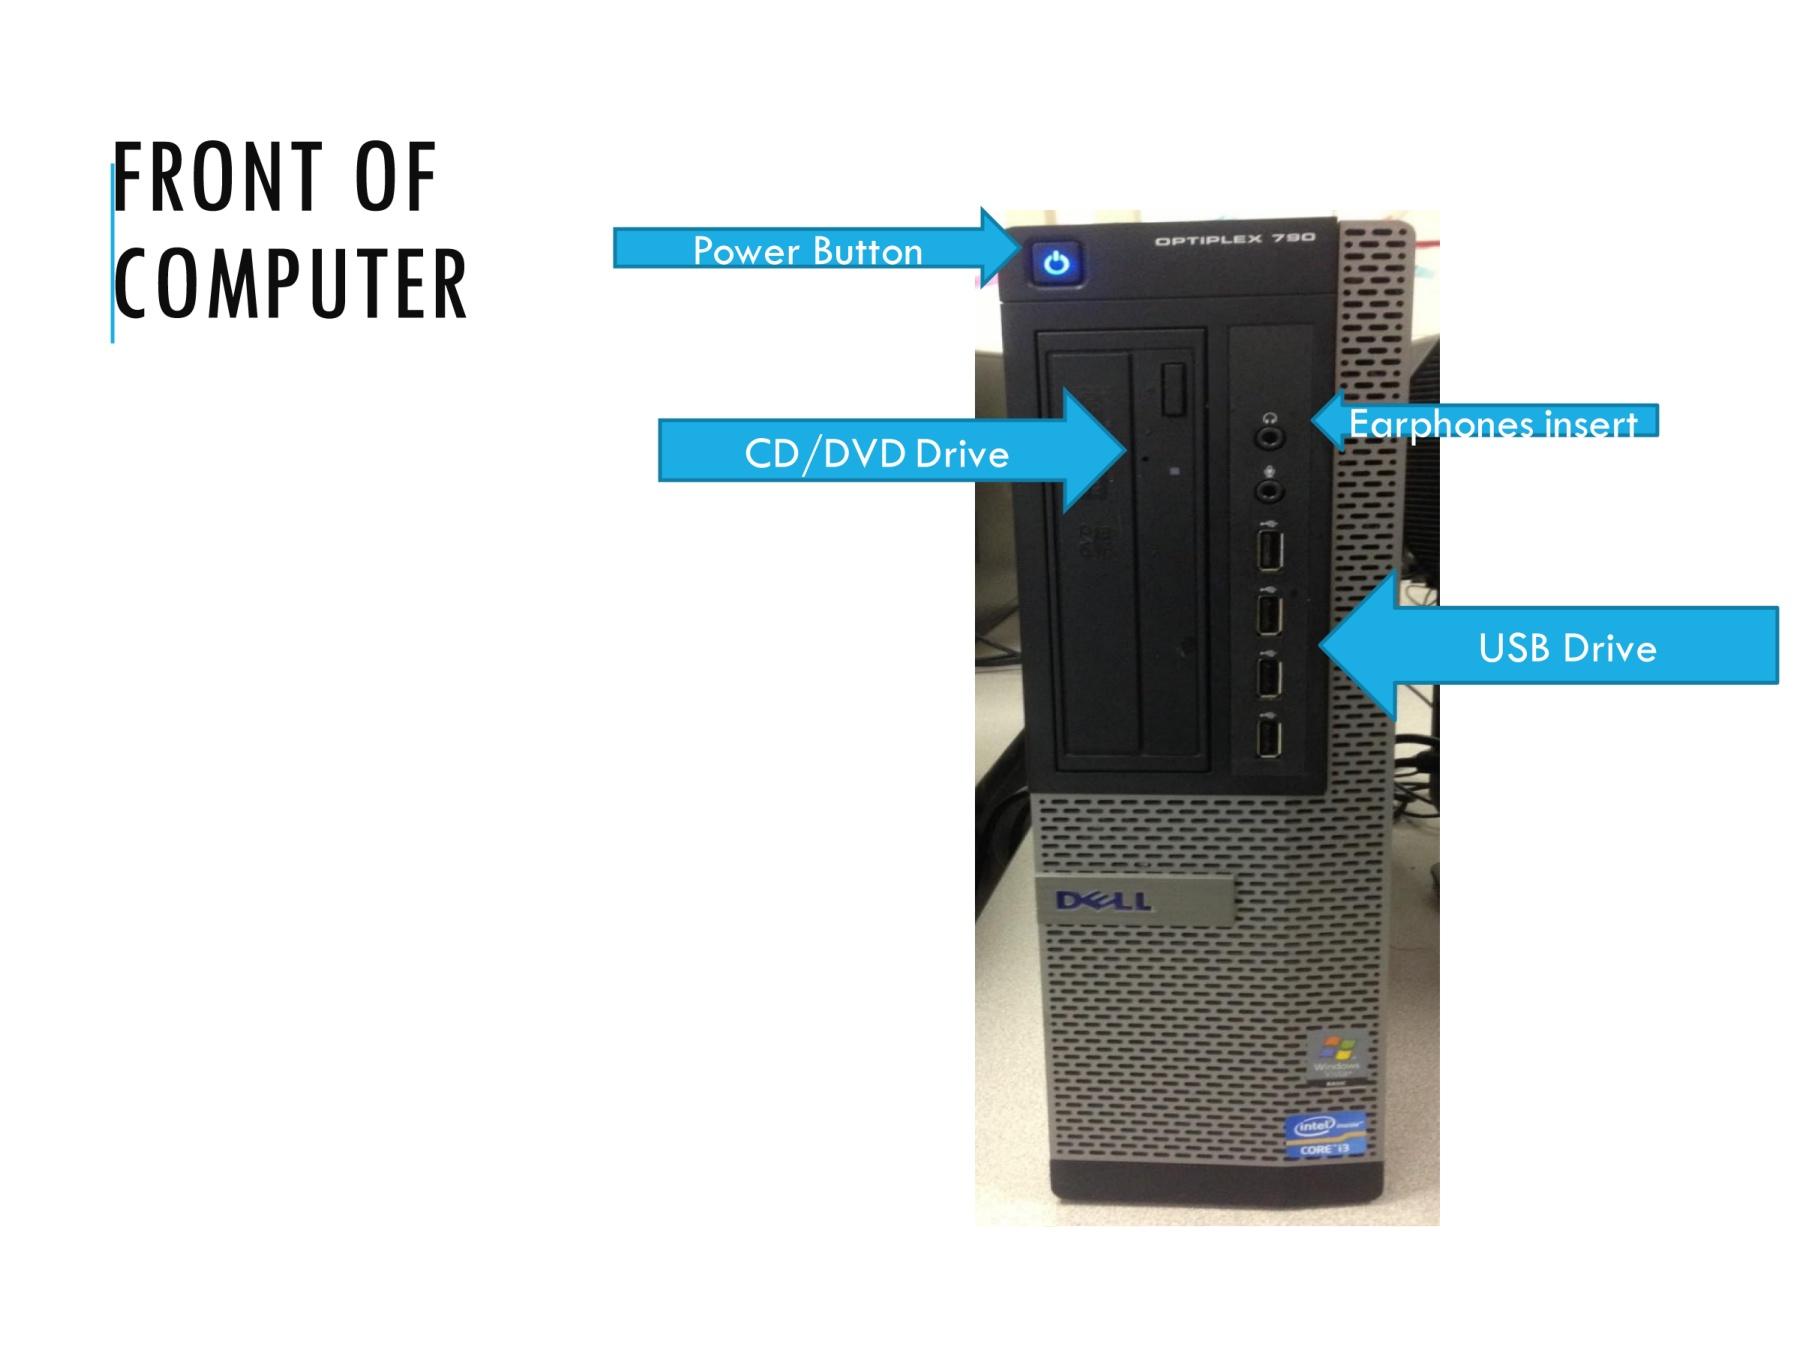 31 Label Parts Of A Computer